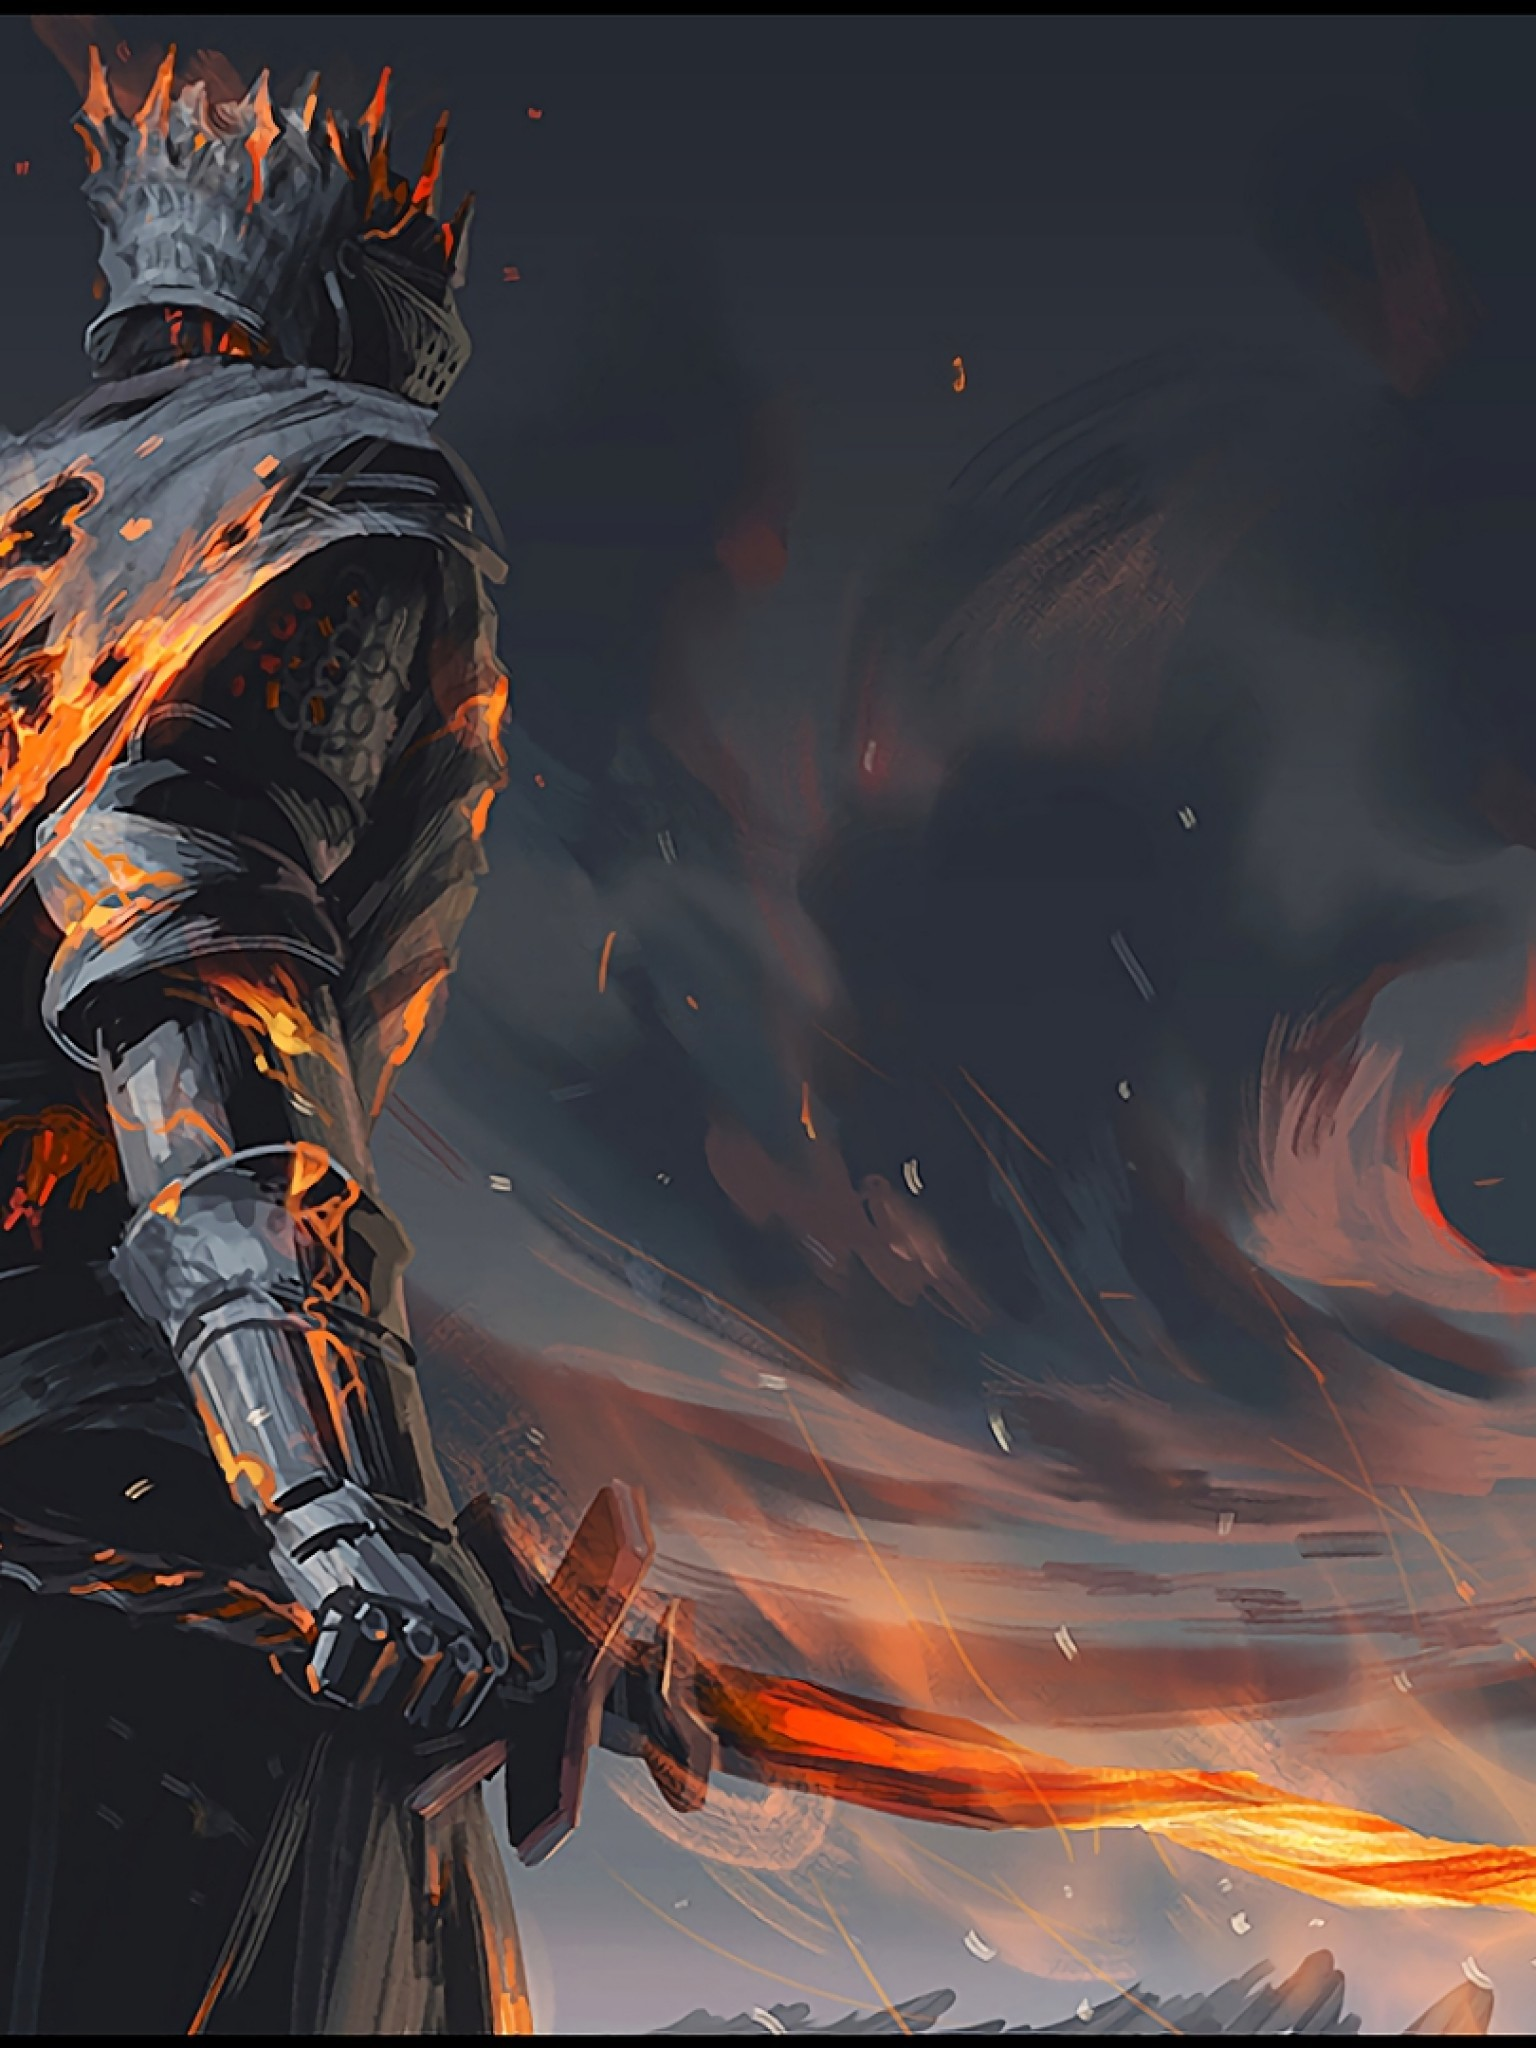 Dark Souls, Soul Of Cinder, Boss, Sword, Fire, Artwork